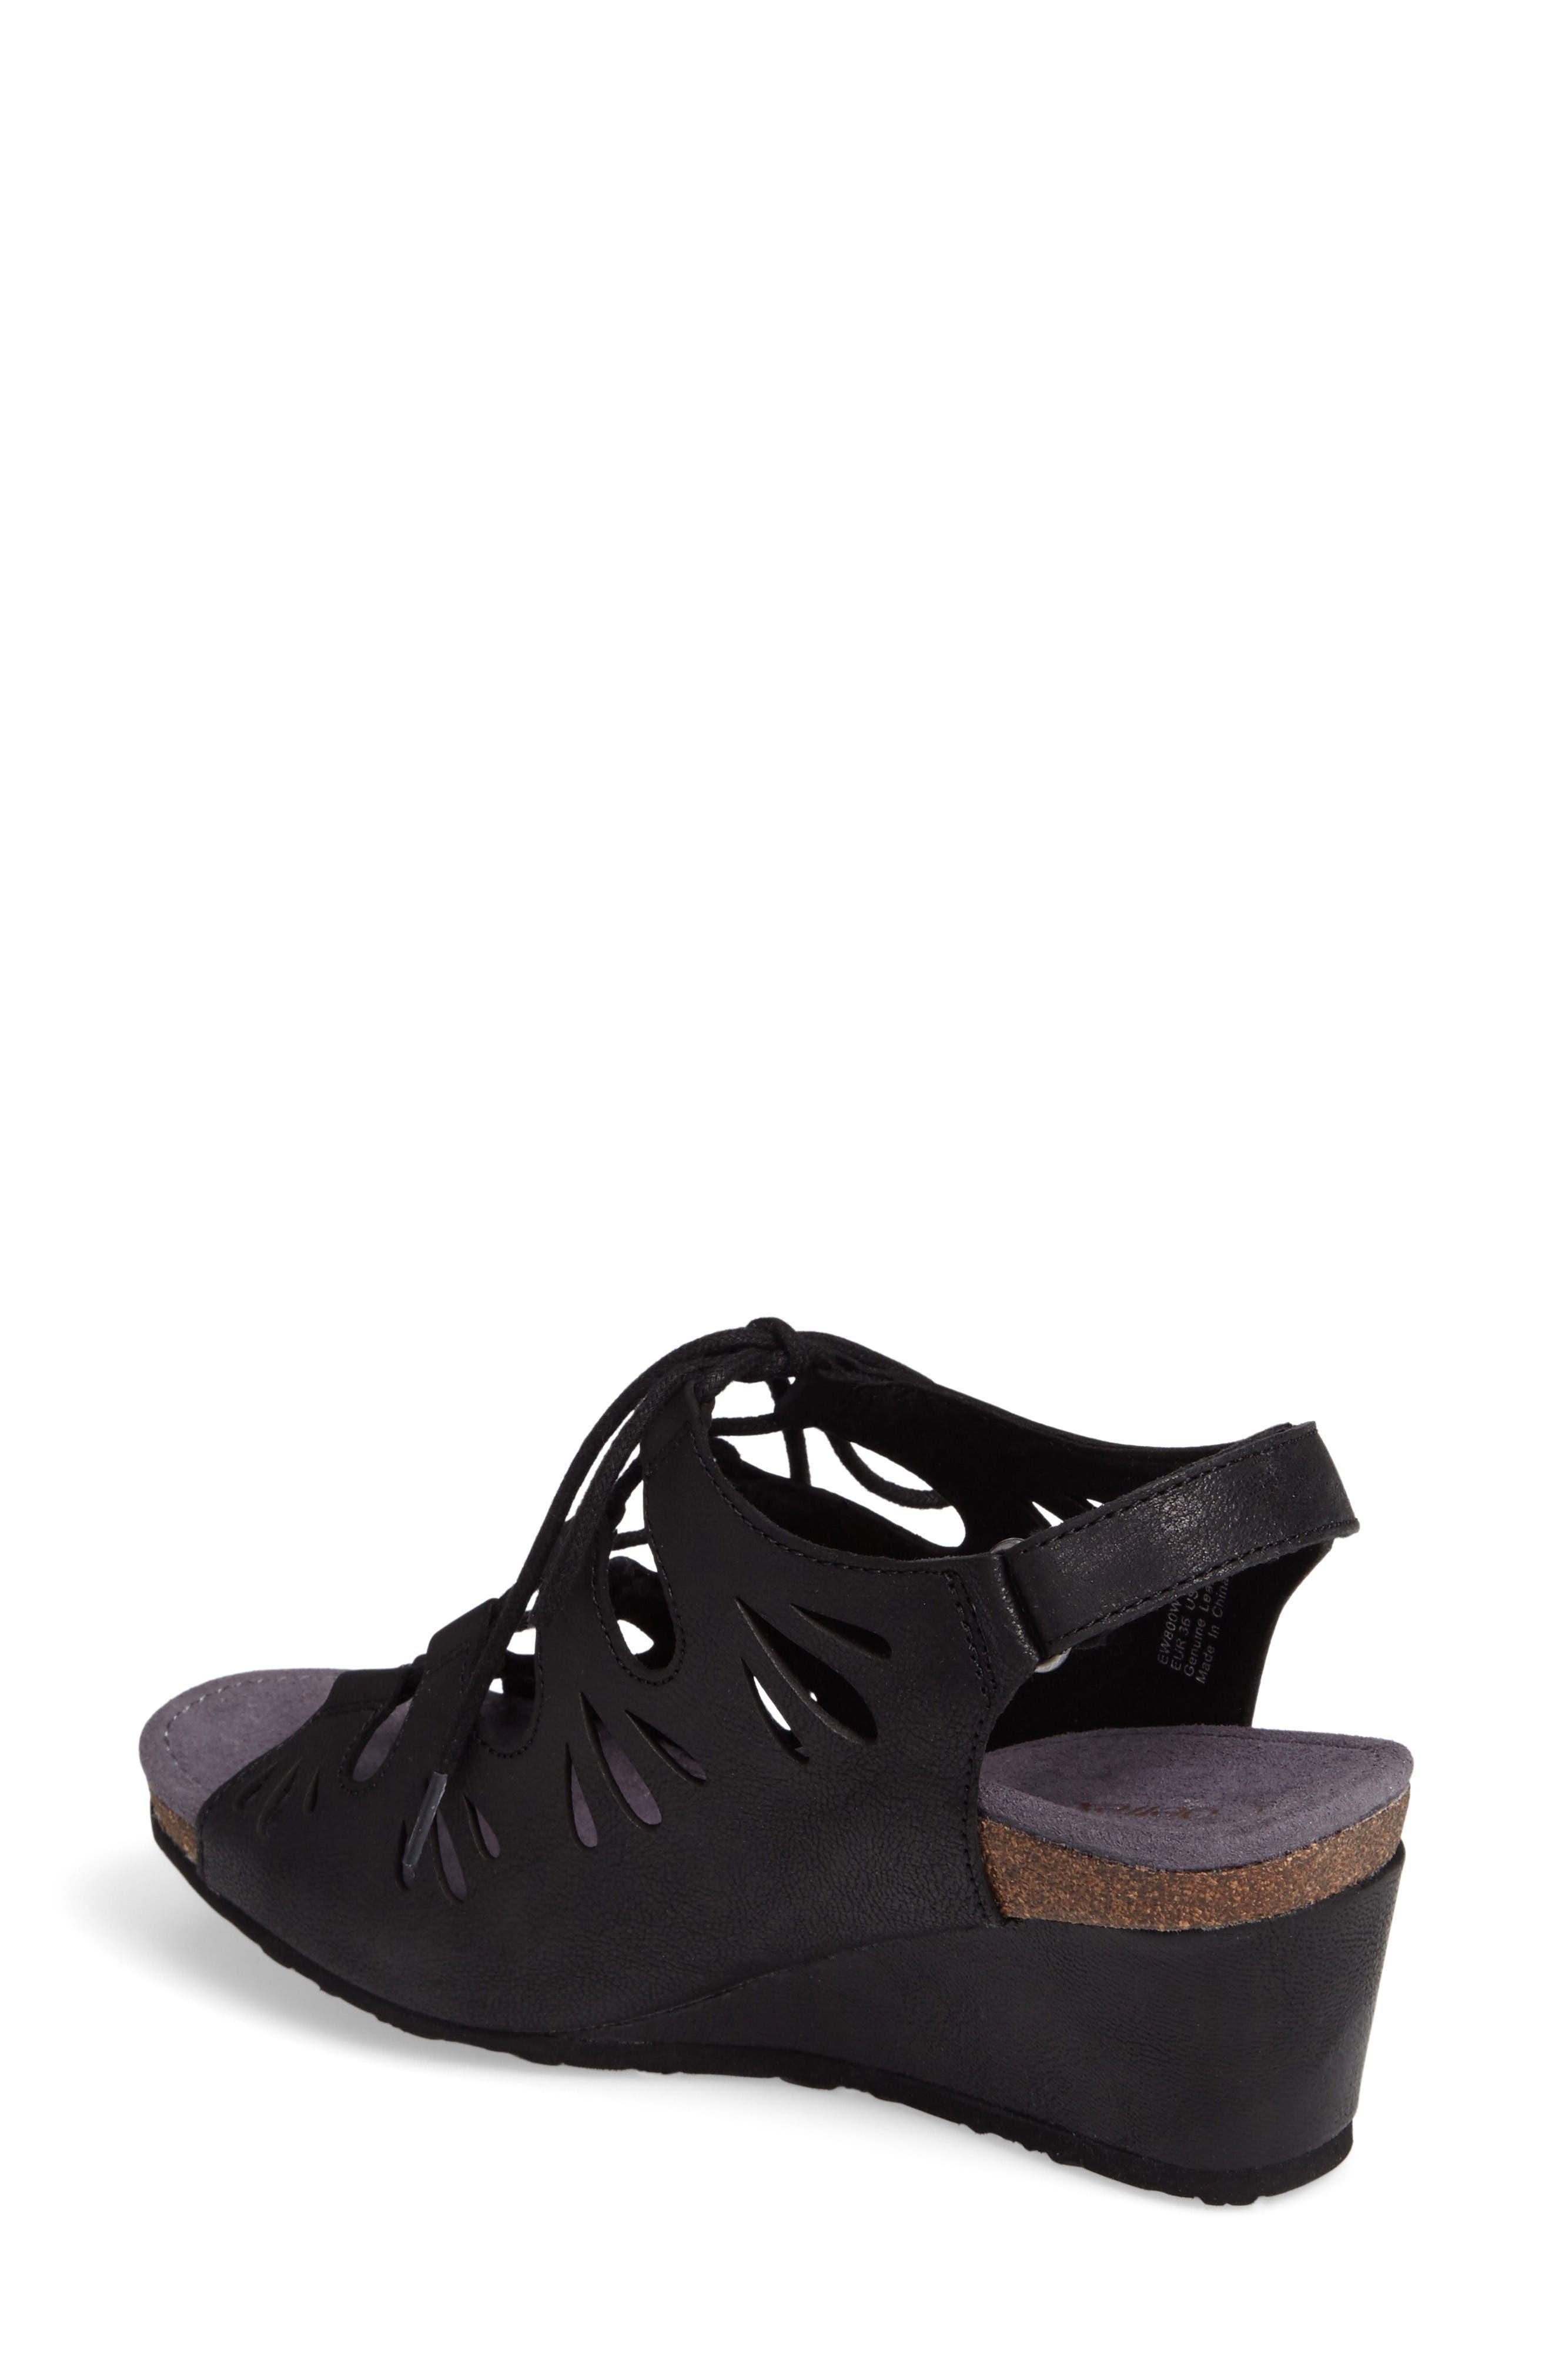 Giselle Slingback Wedge Sandal,                             Alternate thumbnail 2, color,                             Black Leather